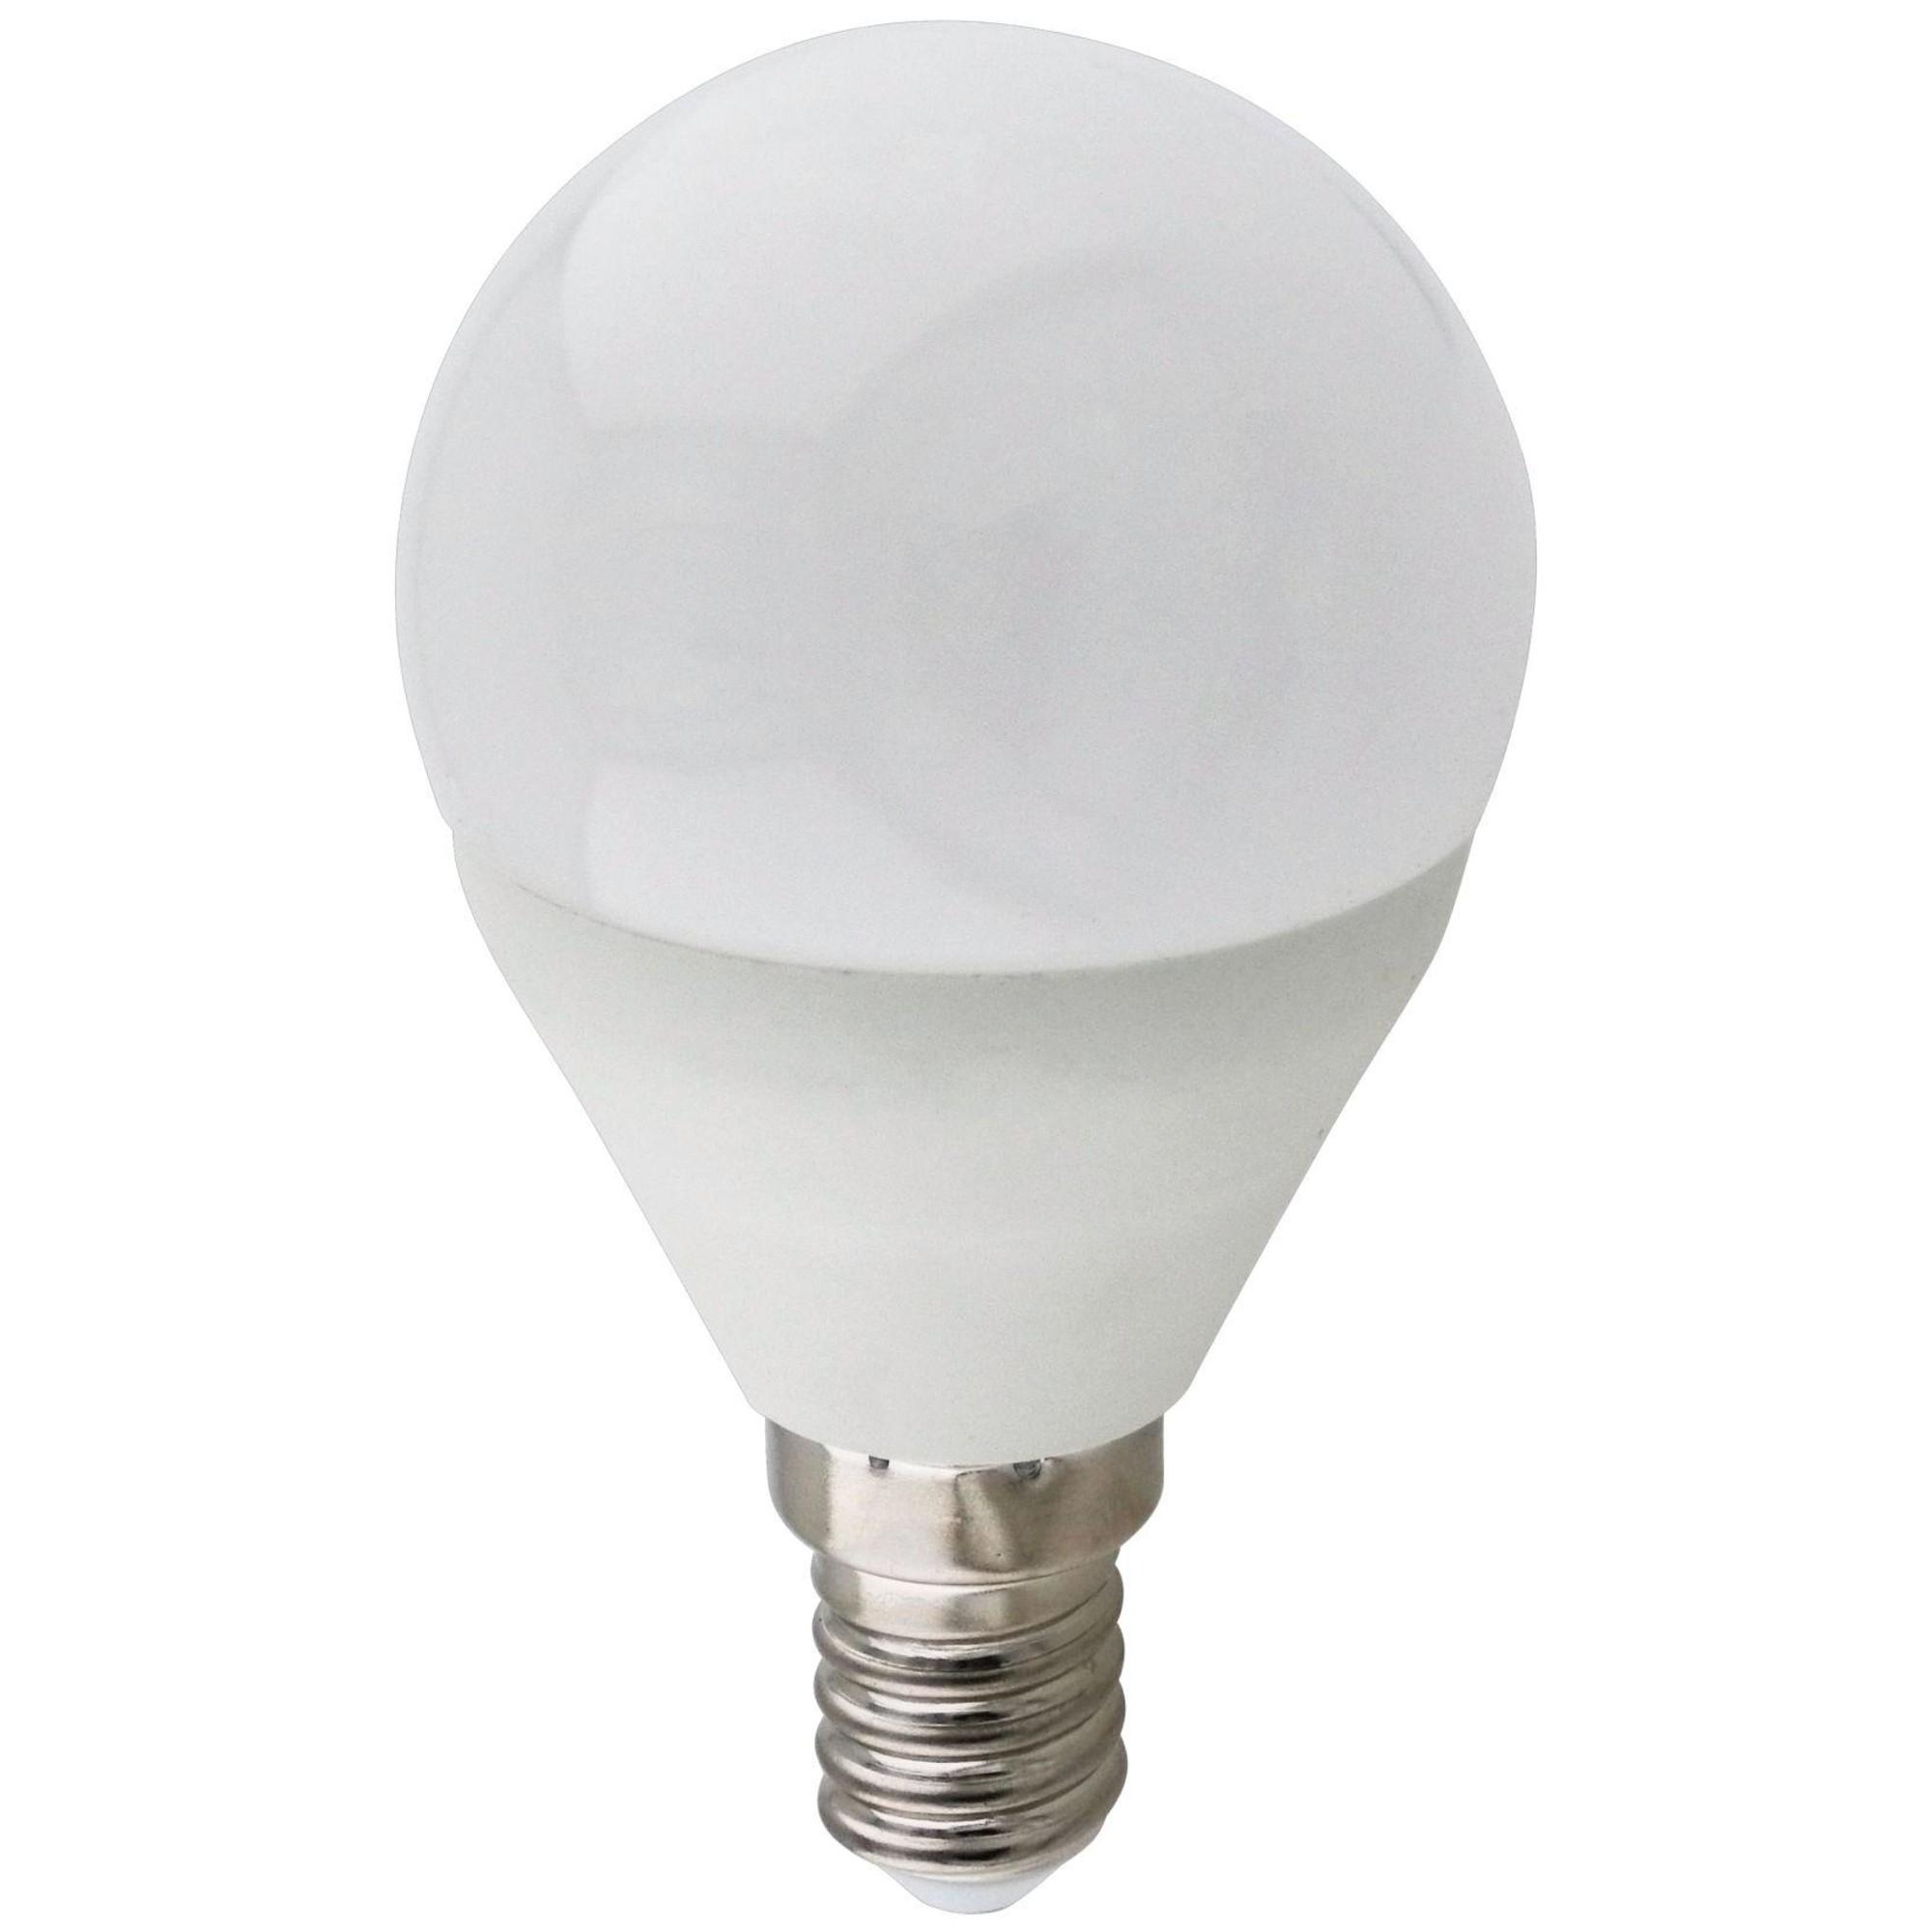 Лампа Ecola Premium светодионая E14 9 Вт шар 810 Лм теплый свет